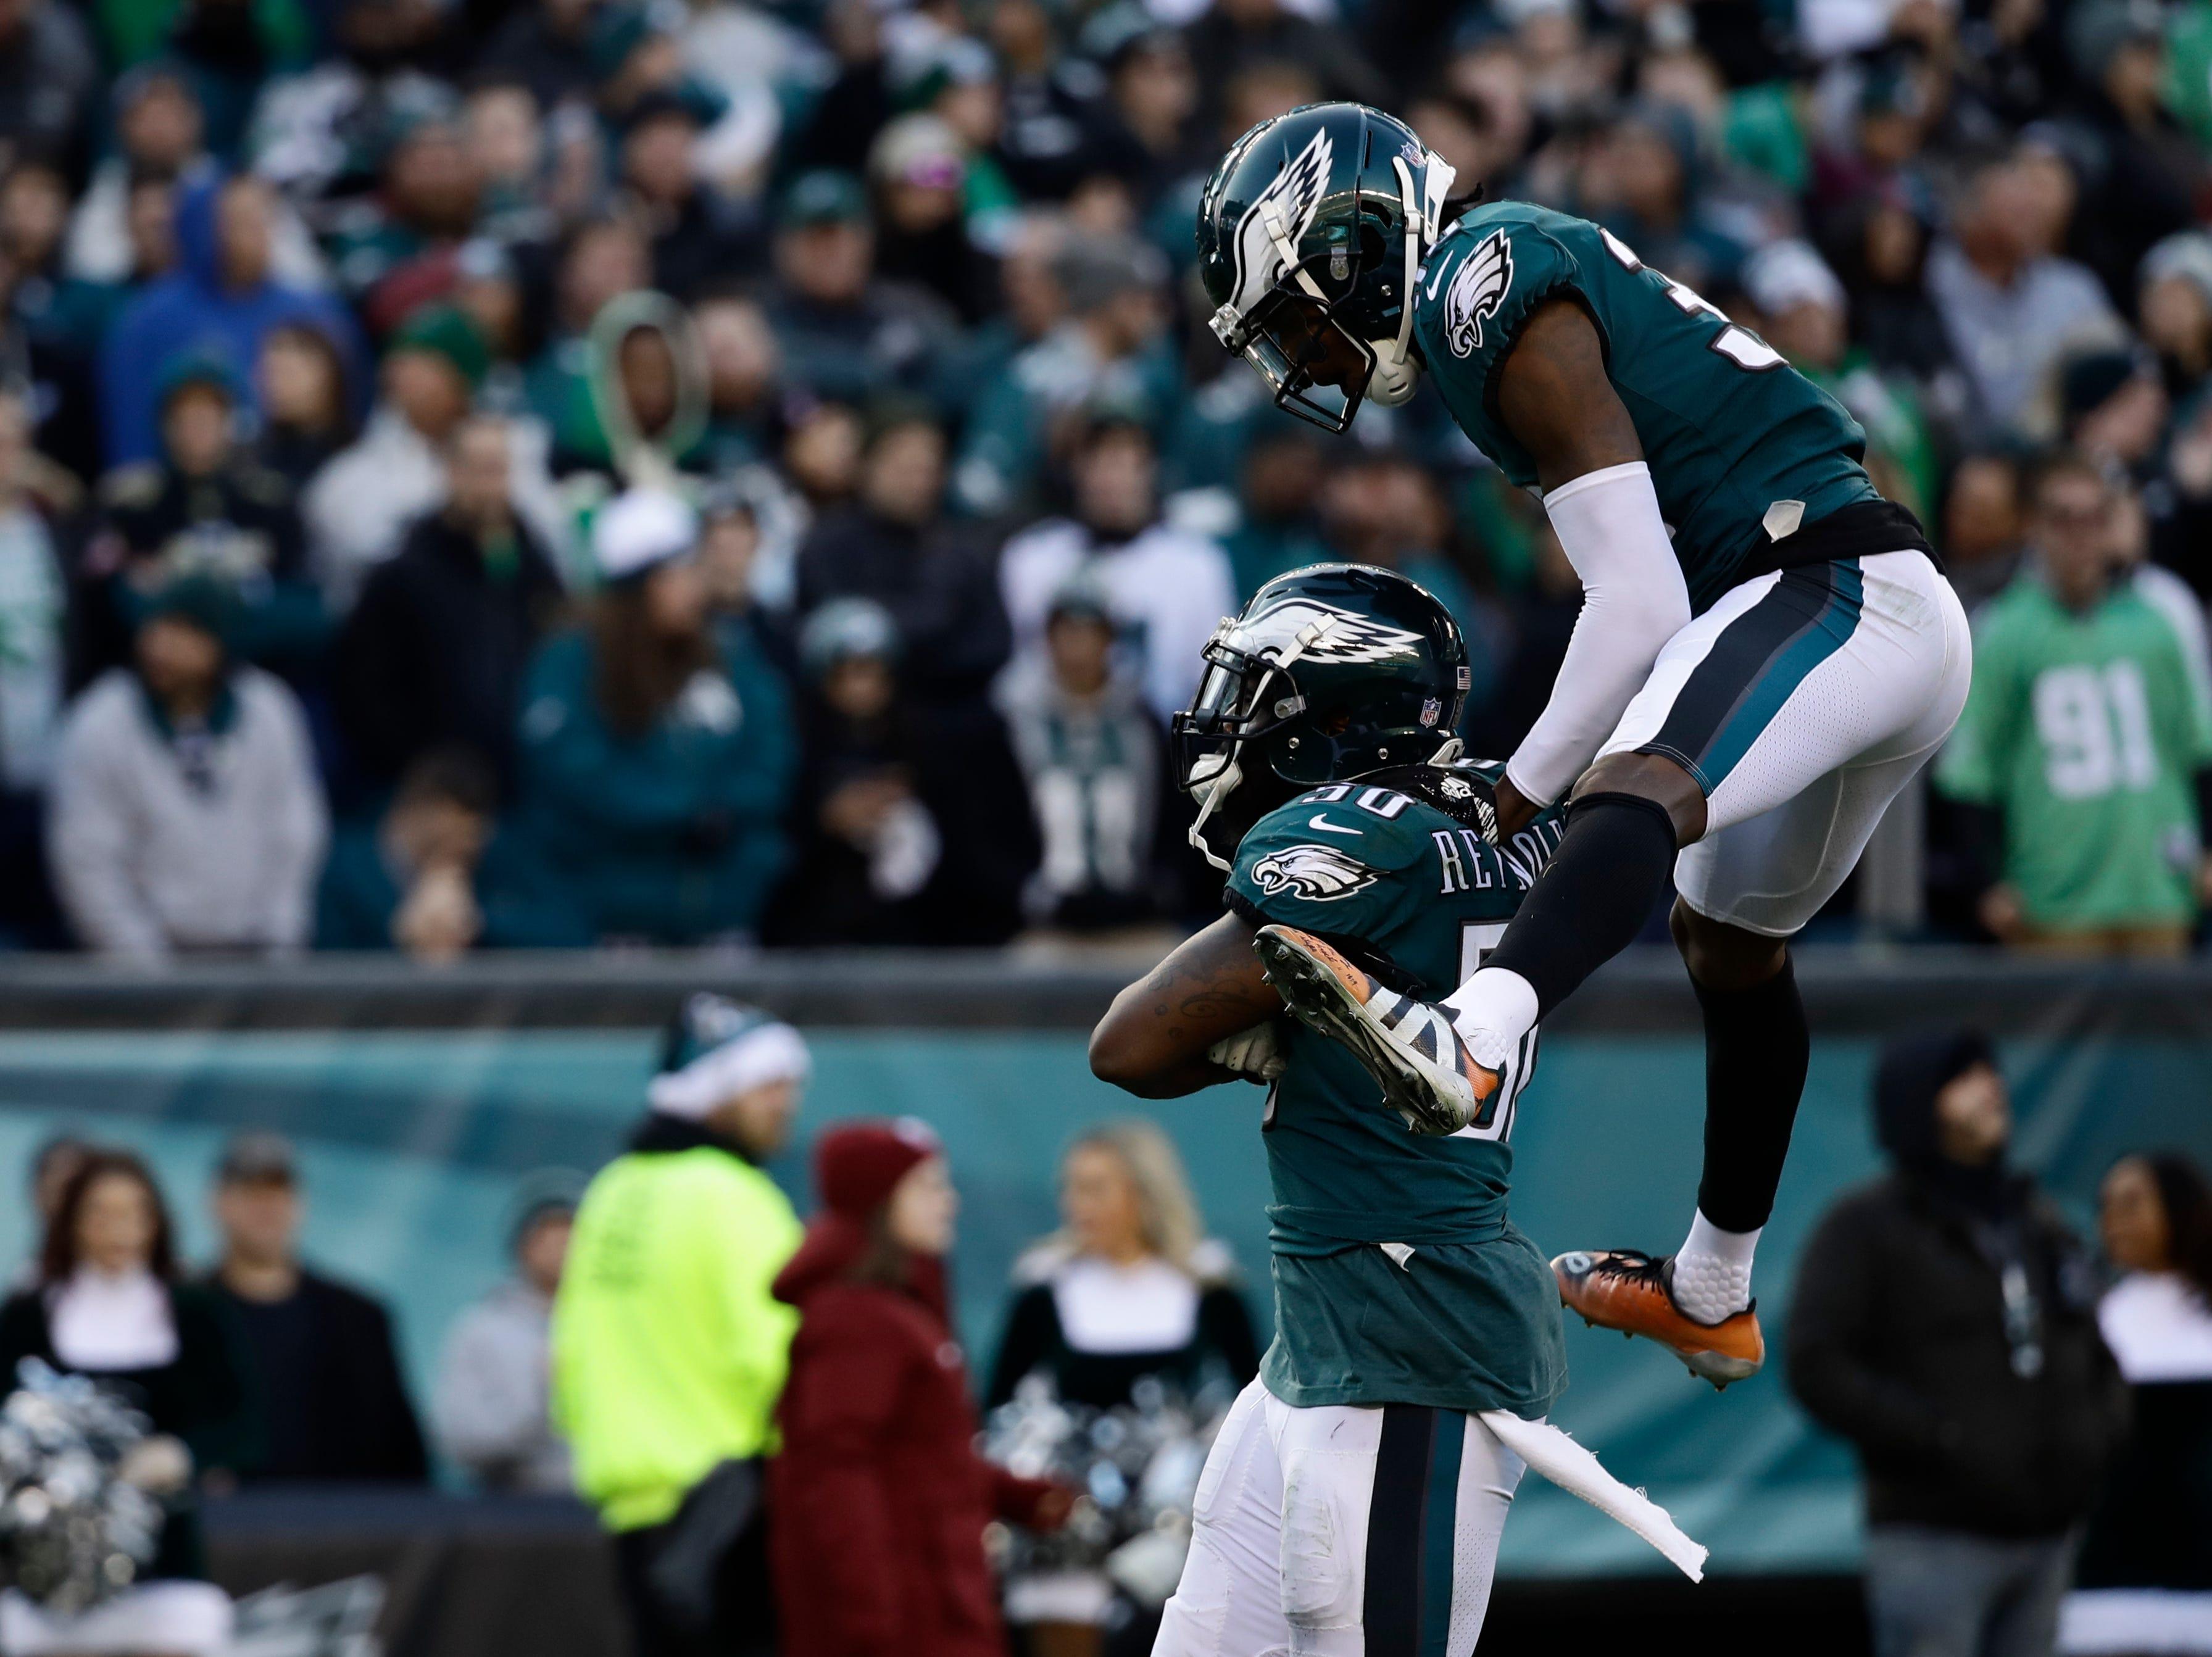 Philadelphia Eagles' LaRoy Reynolds, left, and Deiondre' Hall celebrate during the second half of an NFL football game against the Houston Texans, Sunday, Dec. 23, 2018, in Philadelphia. (AP Photo/Matt Rourke)